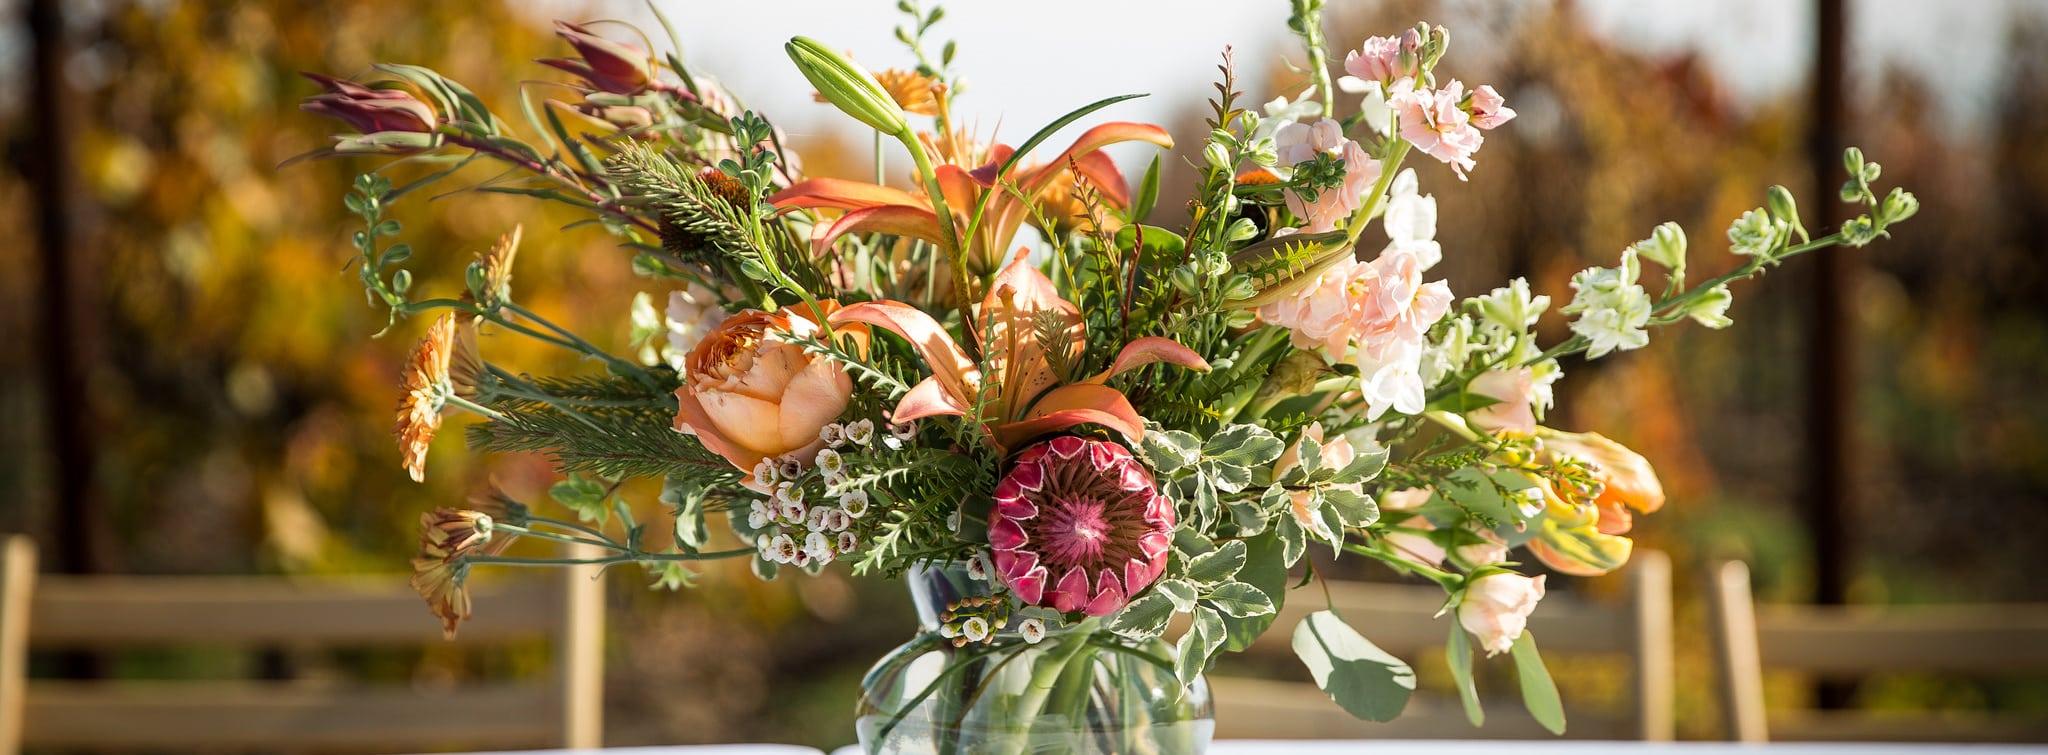 Fall colored floral arrangement.